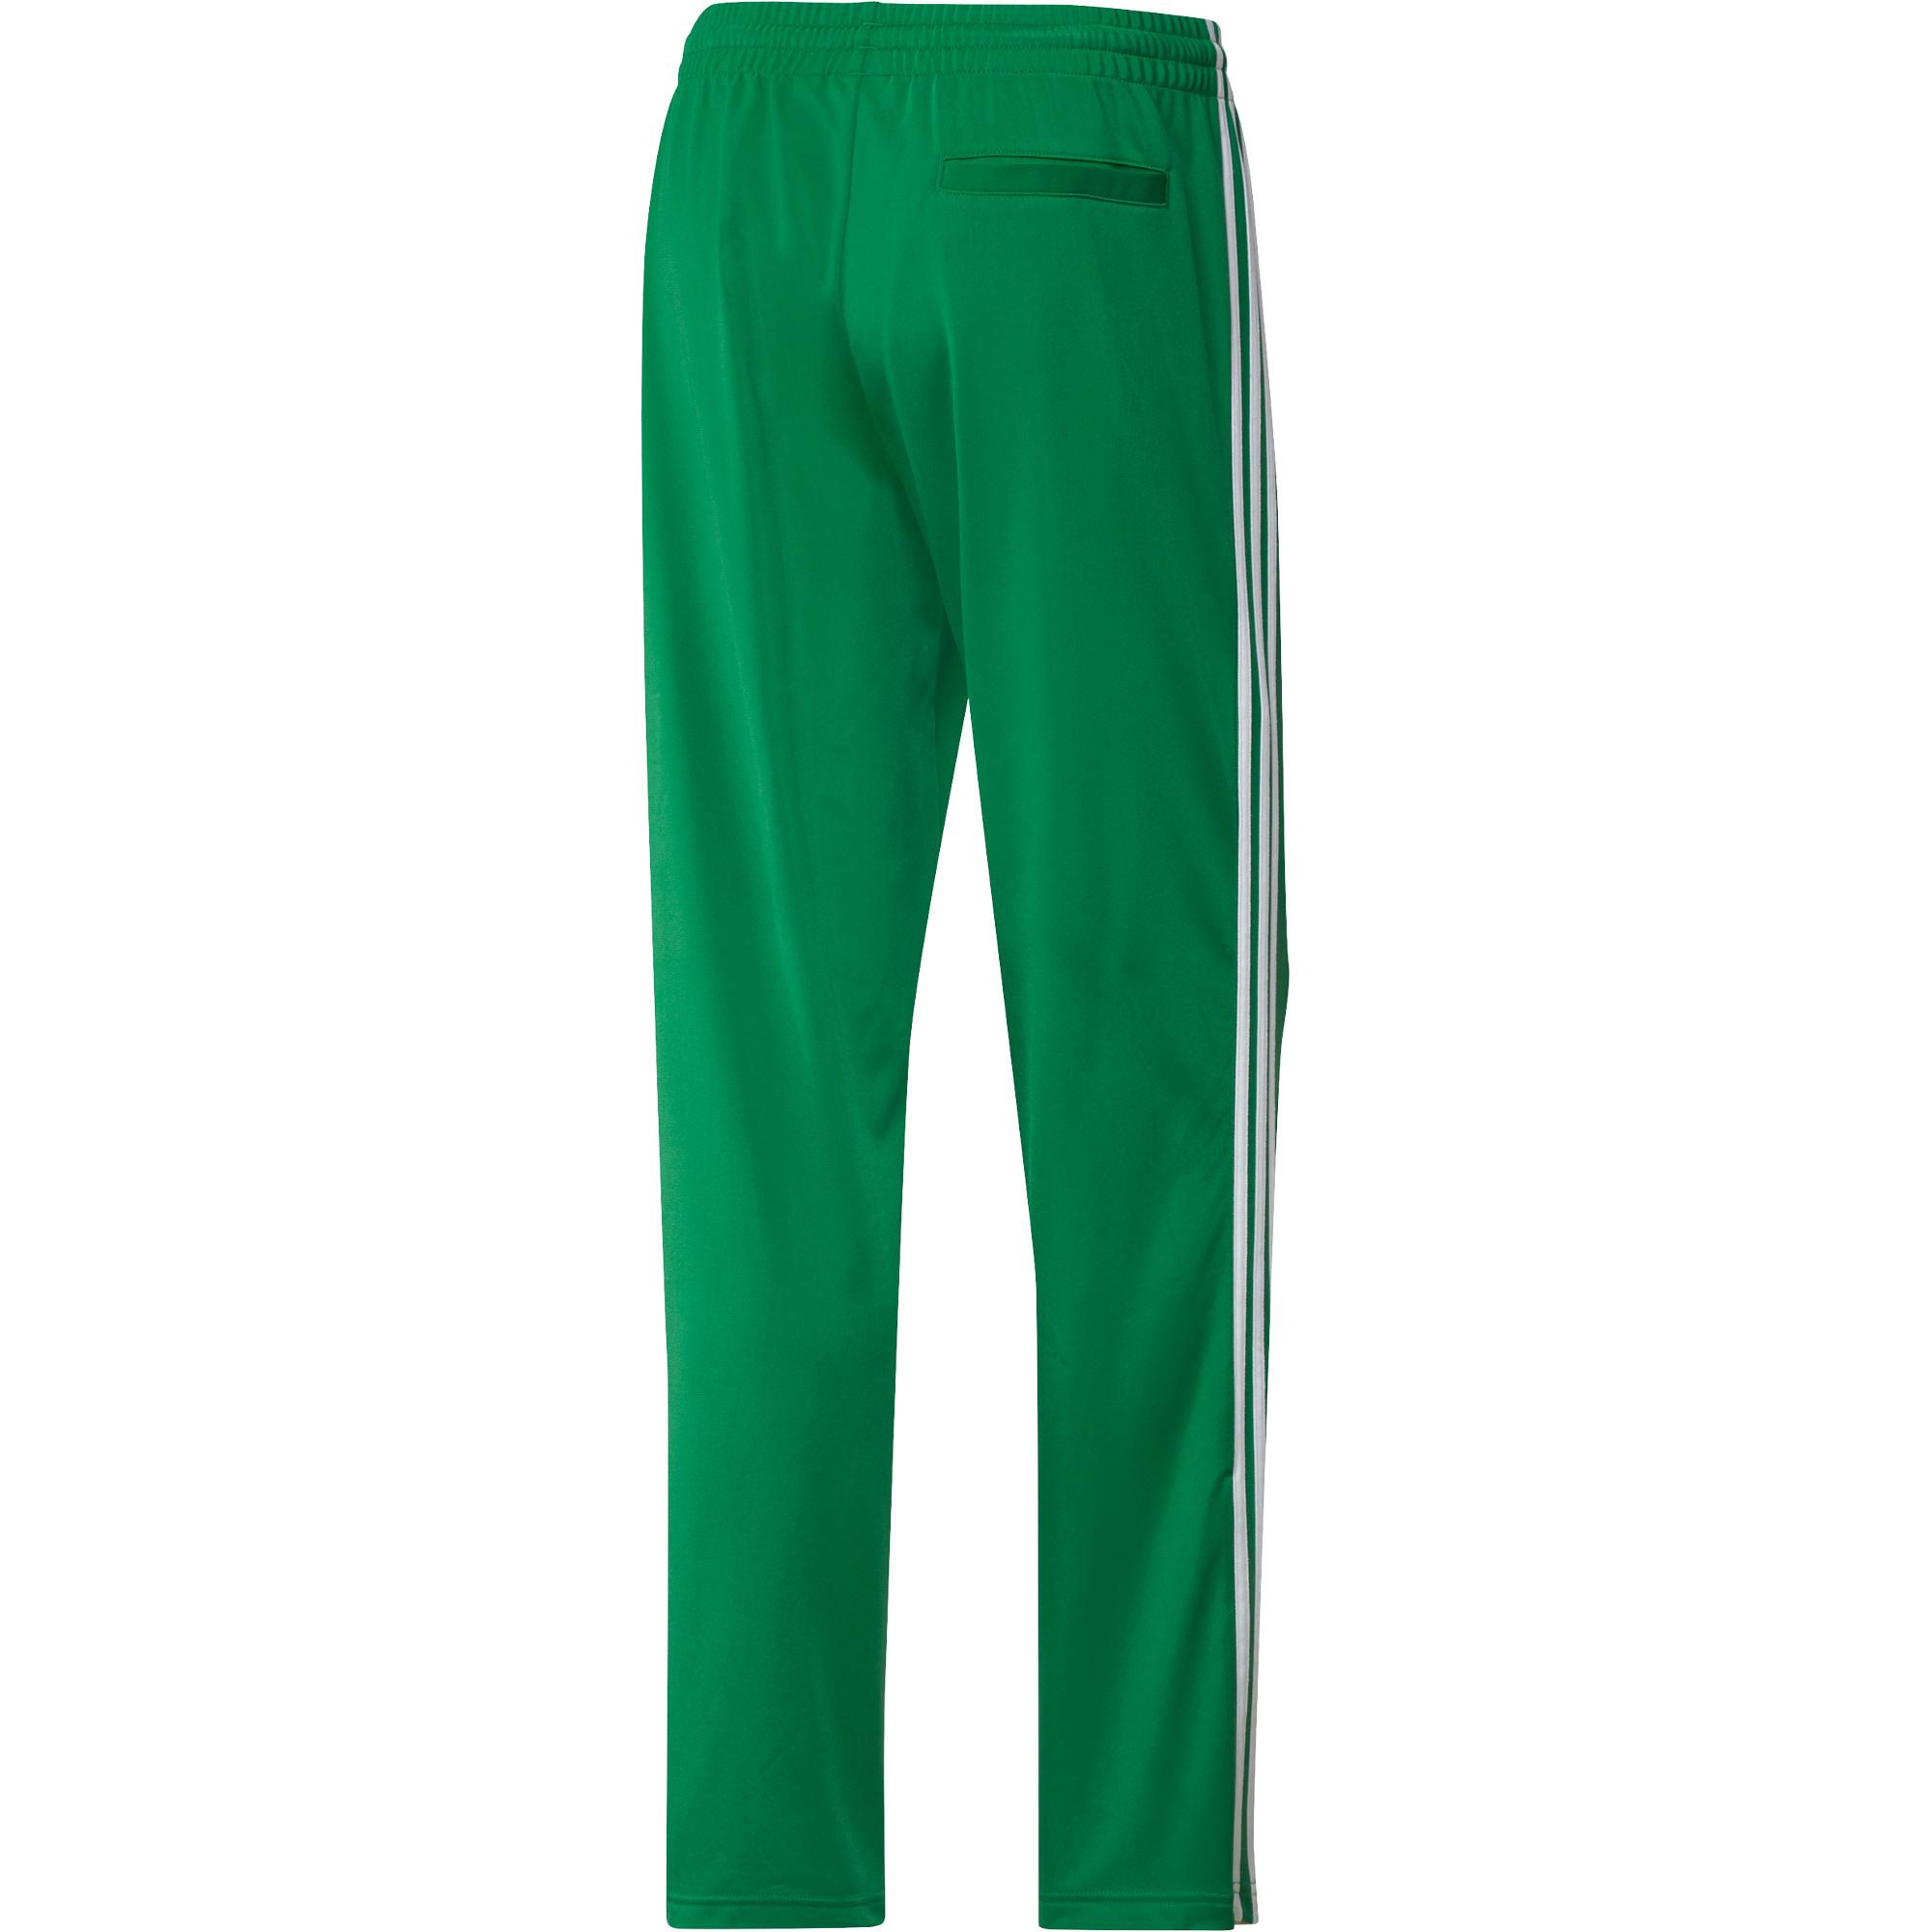 Pantaloni tuta adicolor classics, Verde, large image number 1